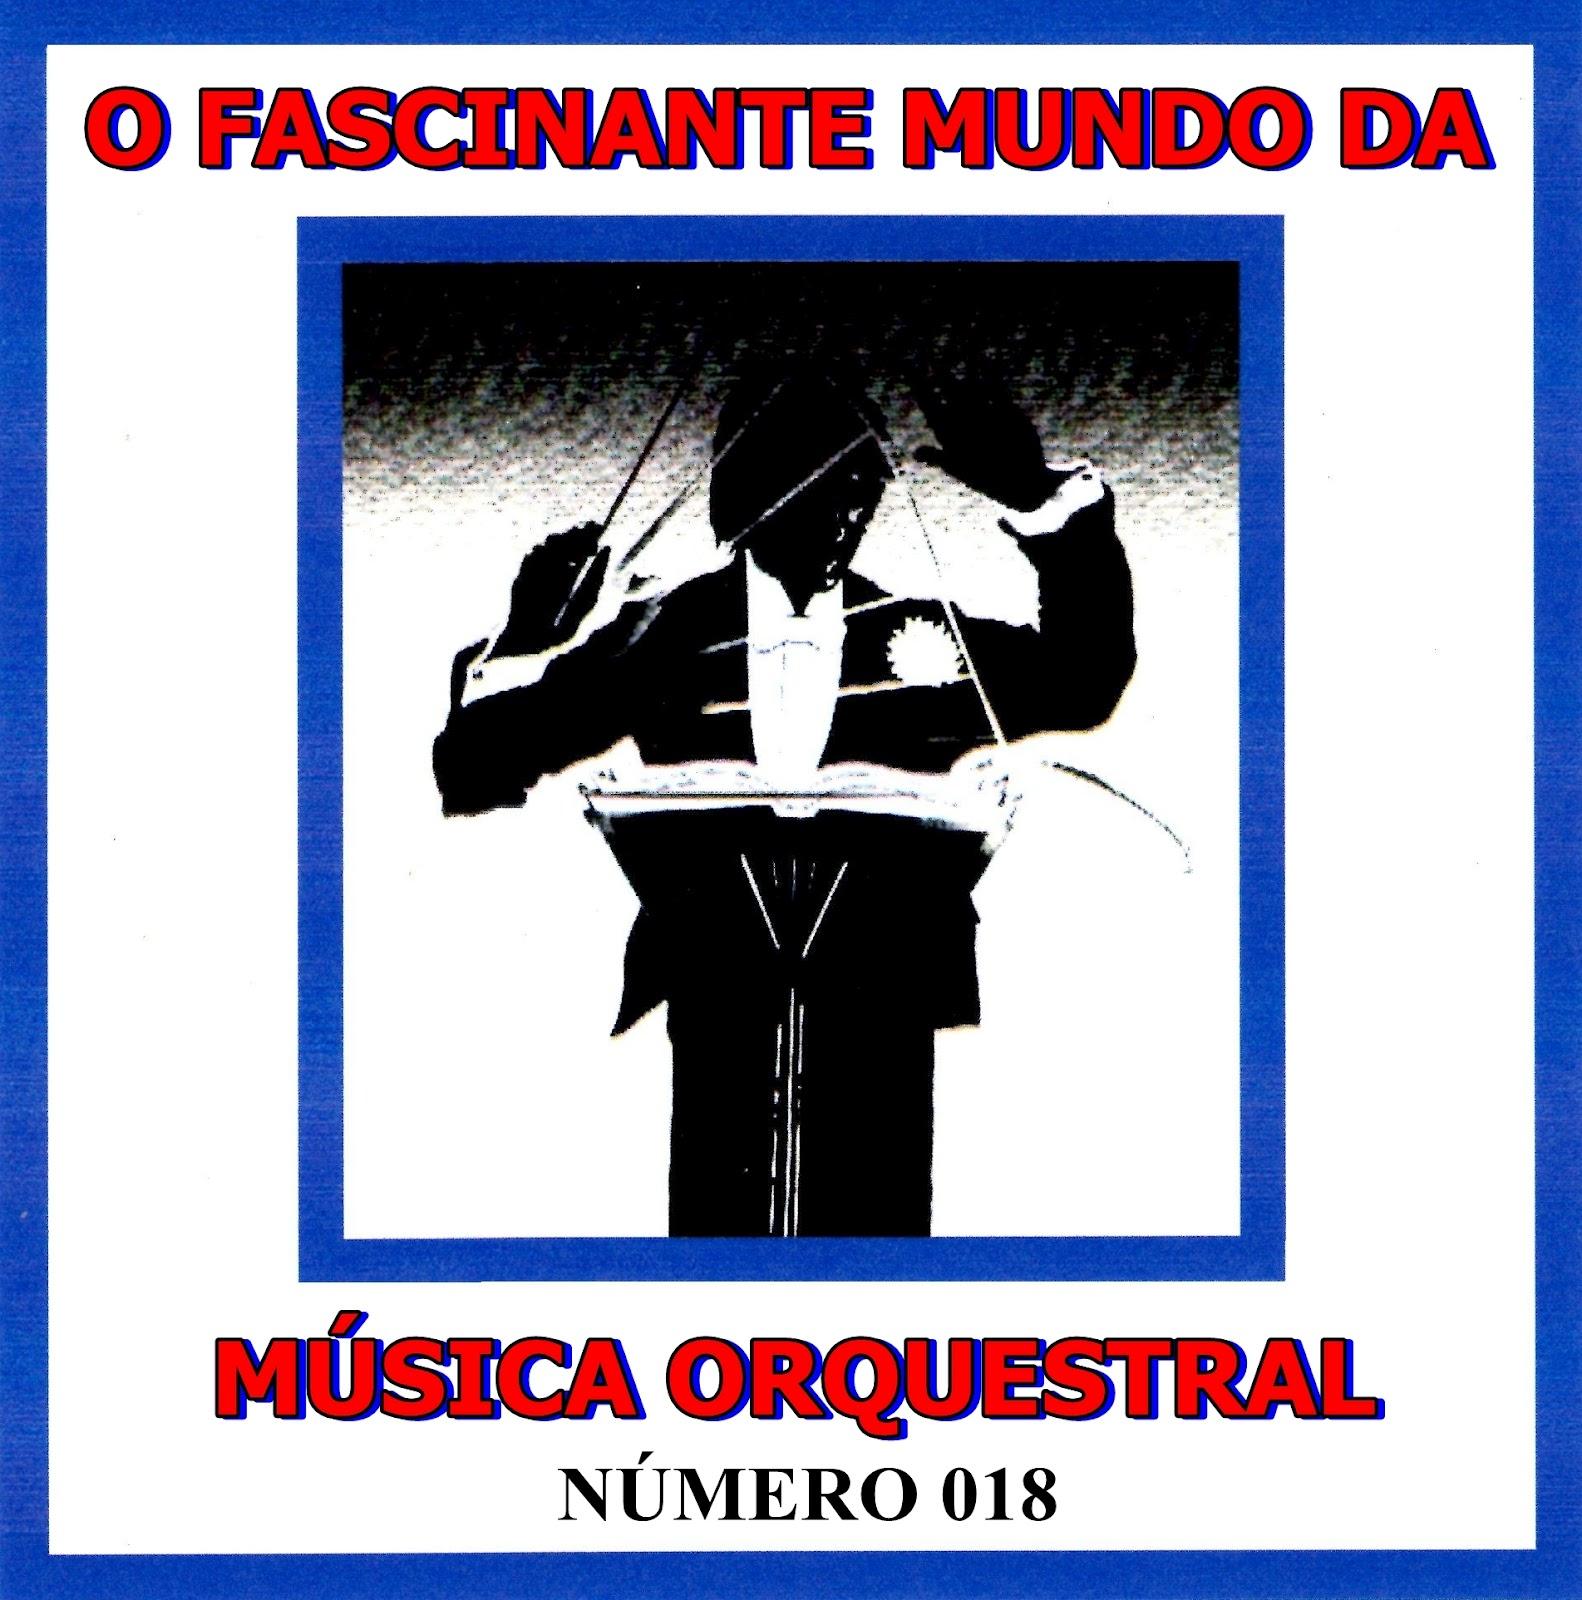 Orchestral music o fascinante mundo da m 250 sica orquestral n 018